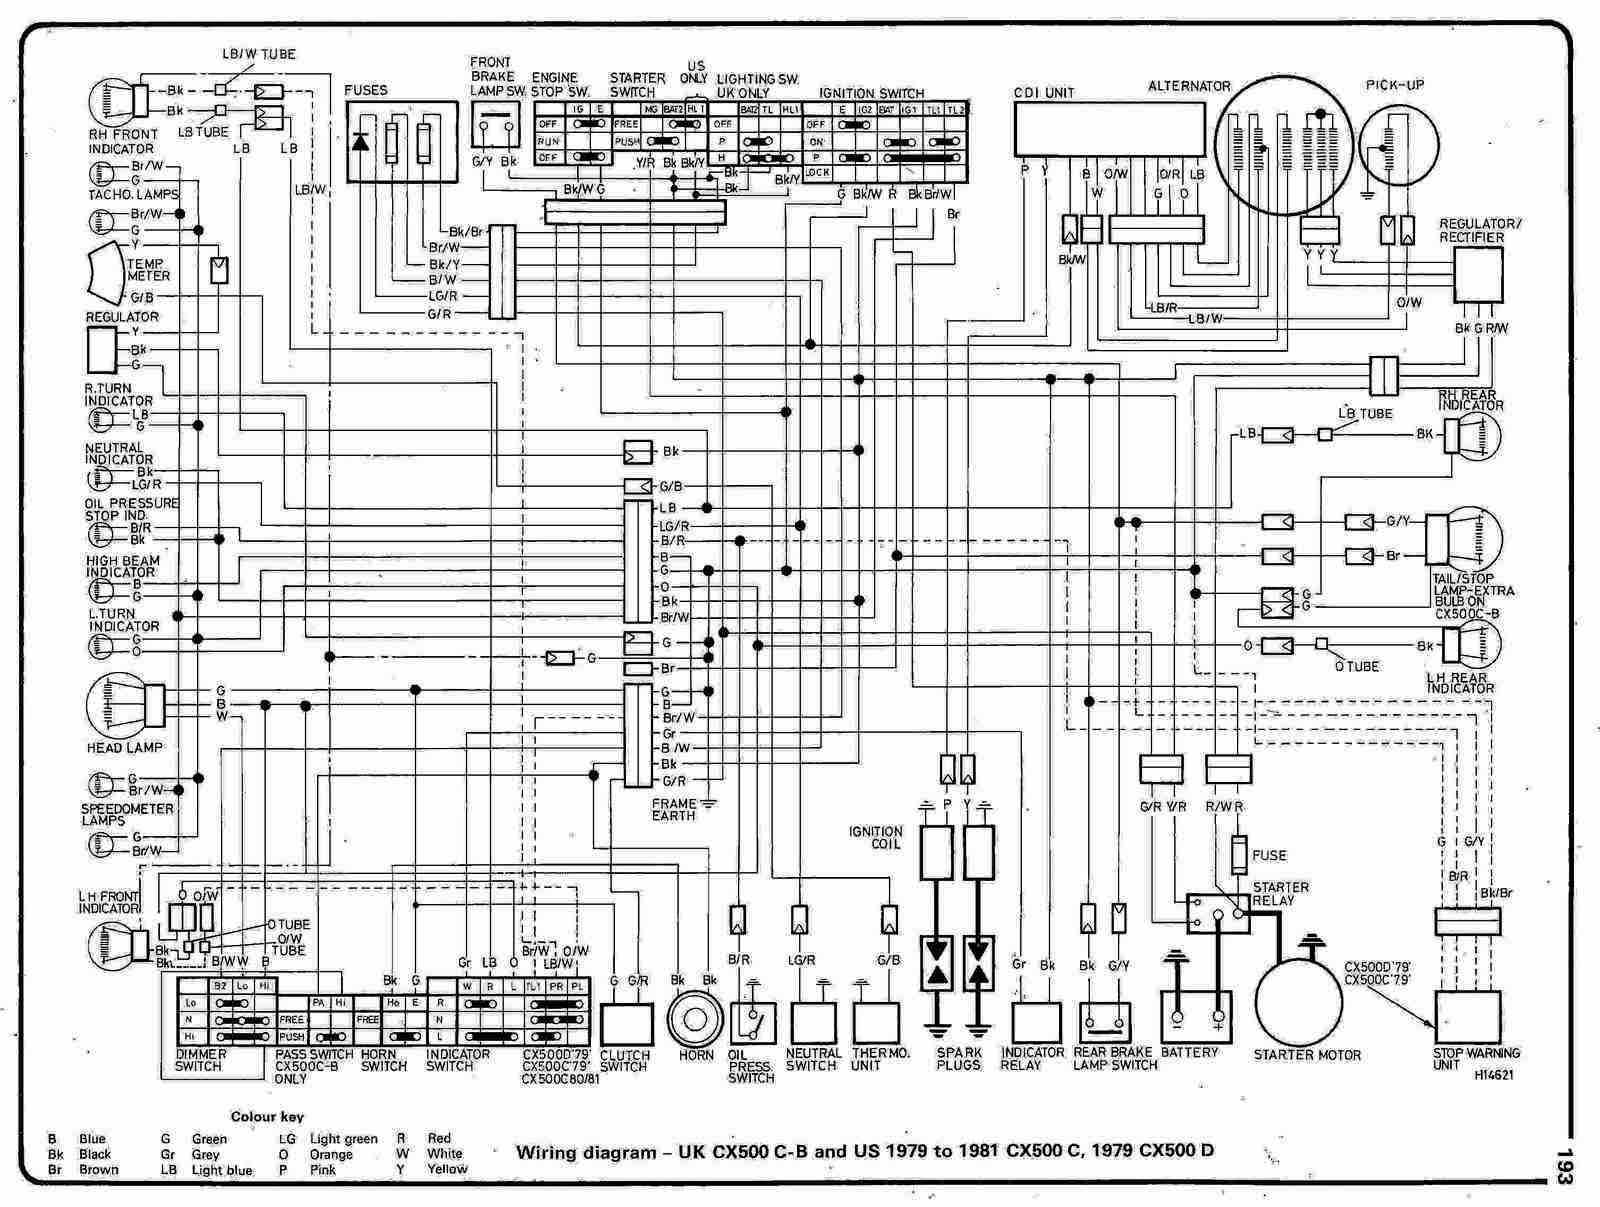 Honda Elite 80 Wiring Diagram Color O2 Sensor 1986 Tires 125 Sabre Sailboat On